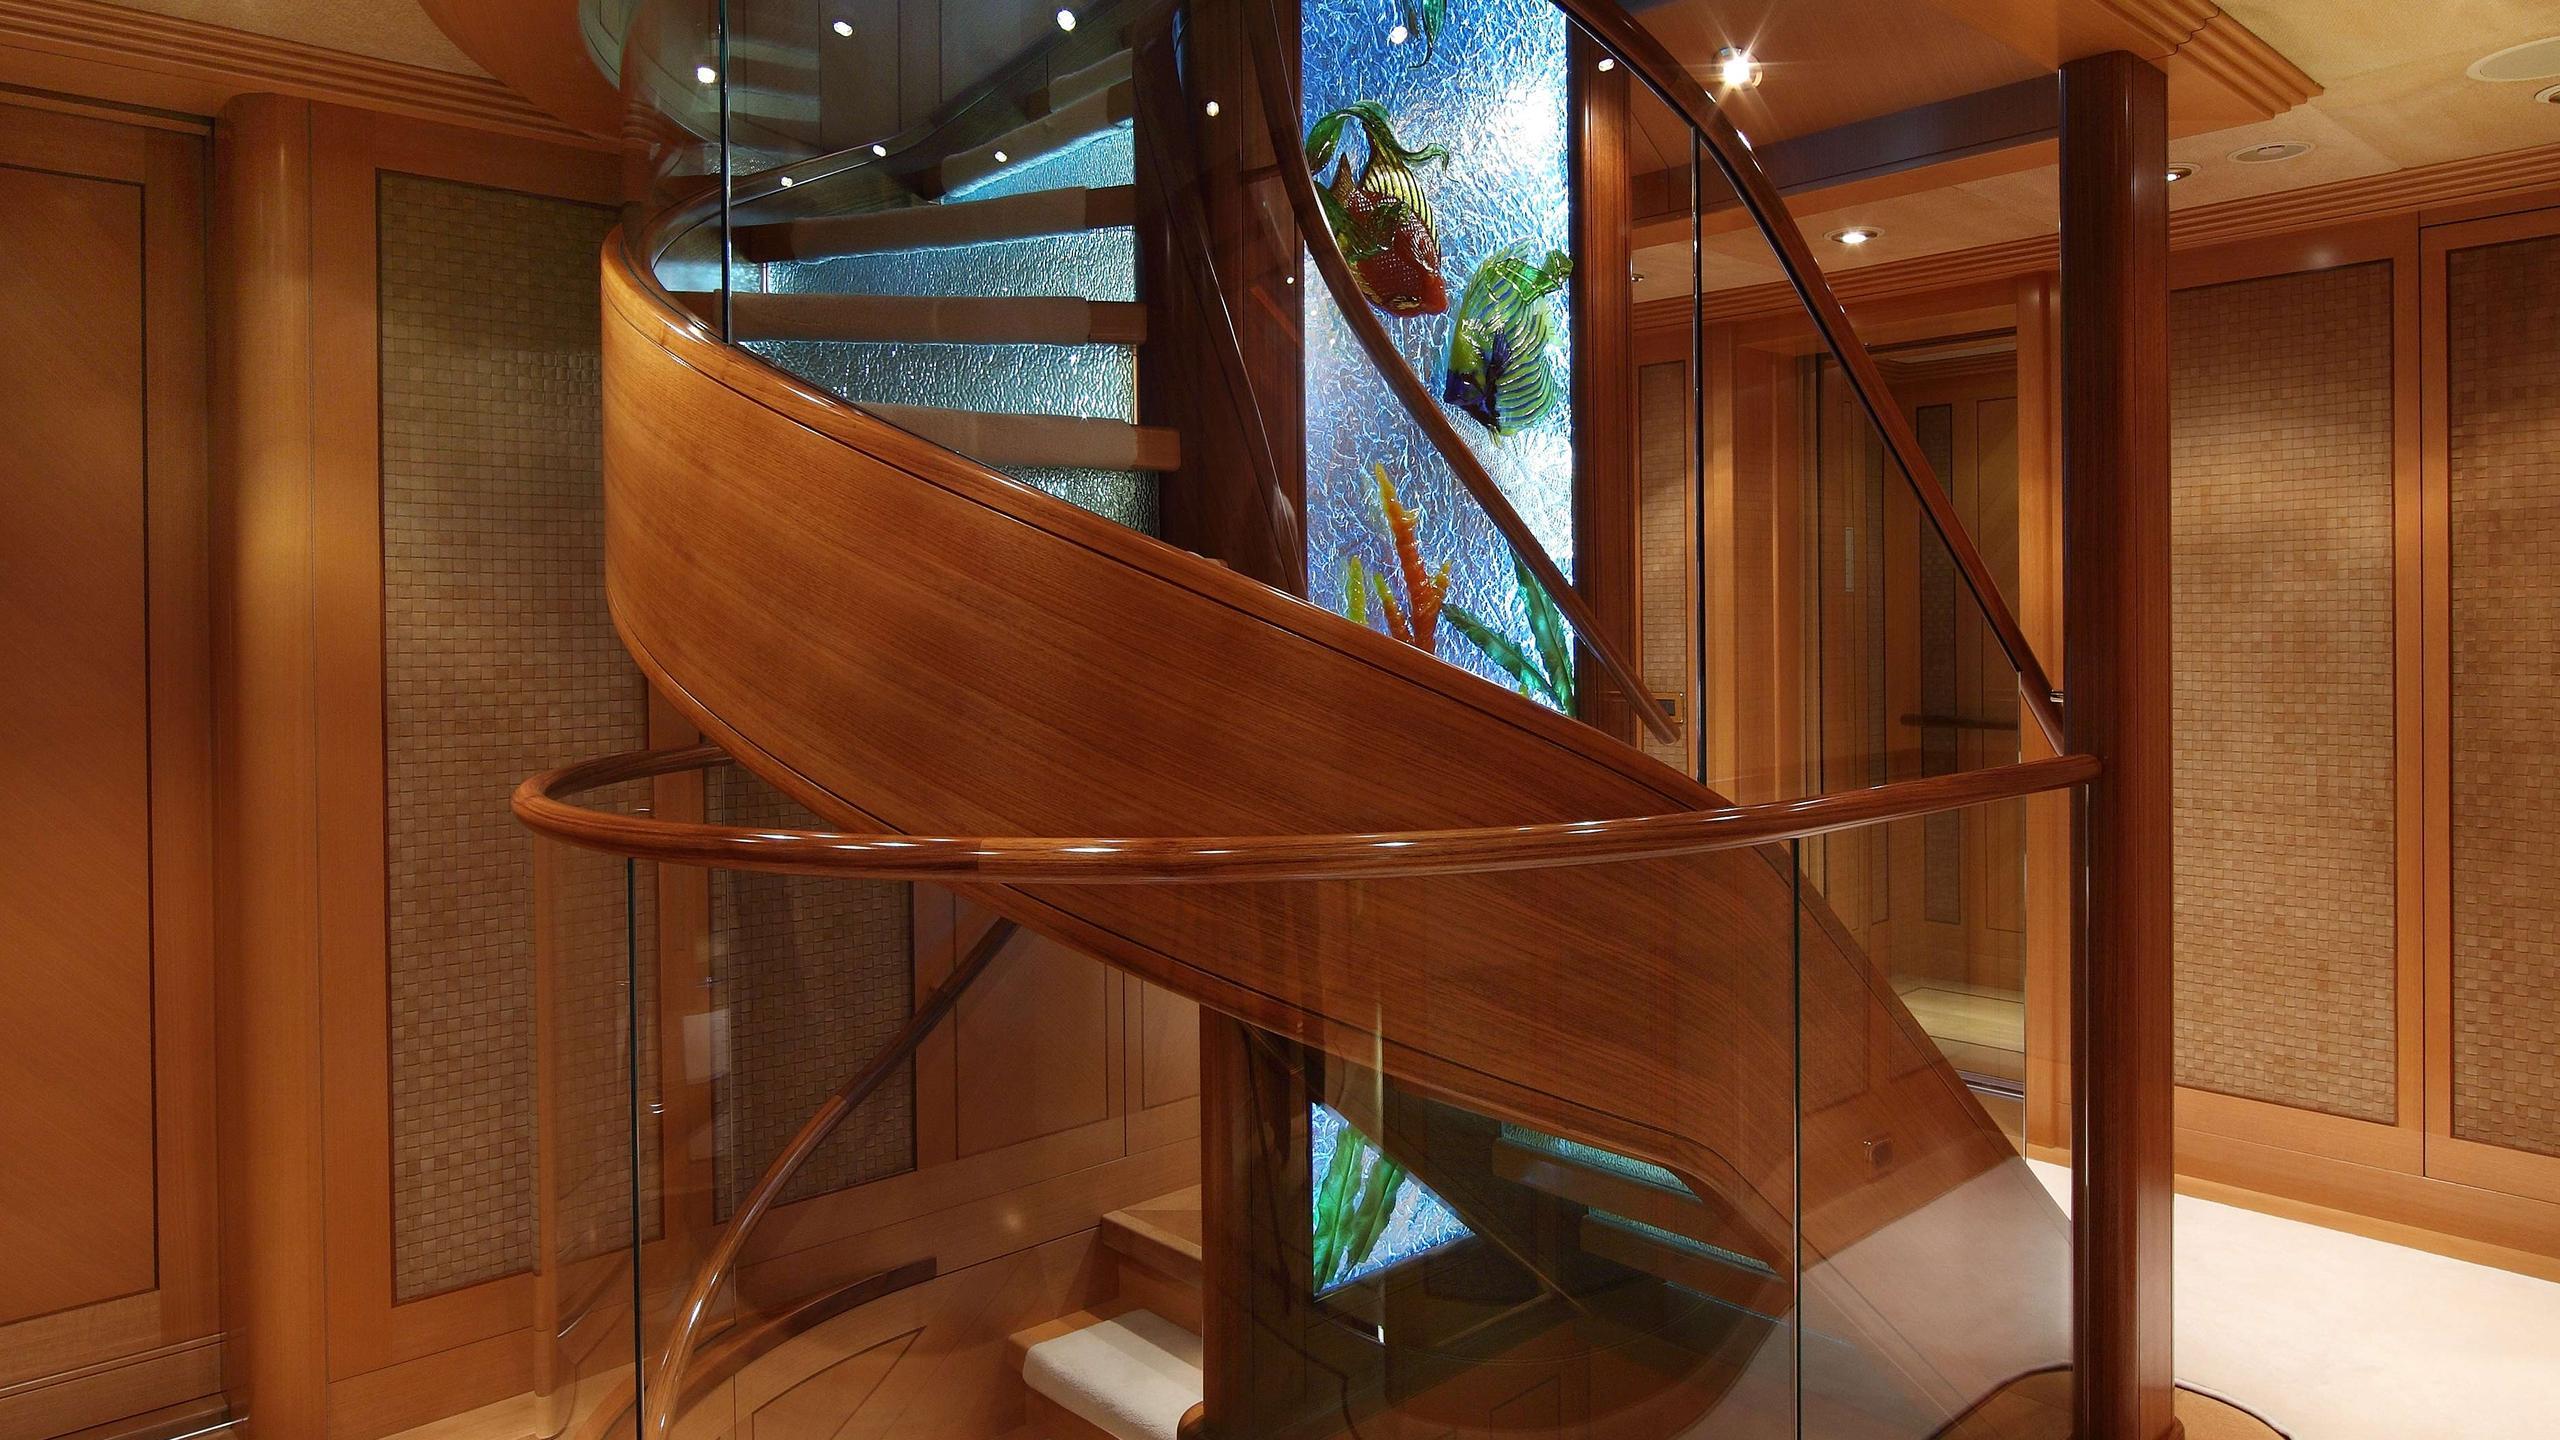 laurel-motor-yacht-delta-marine-2006-73m-foyer-elevator